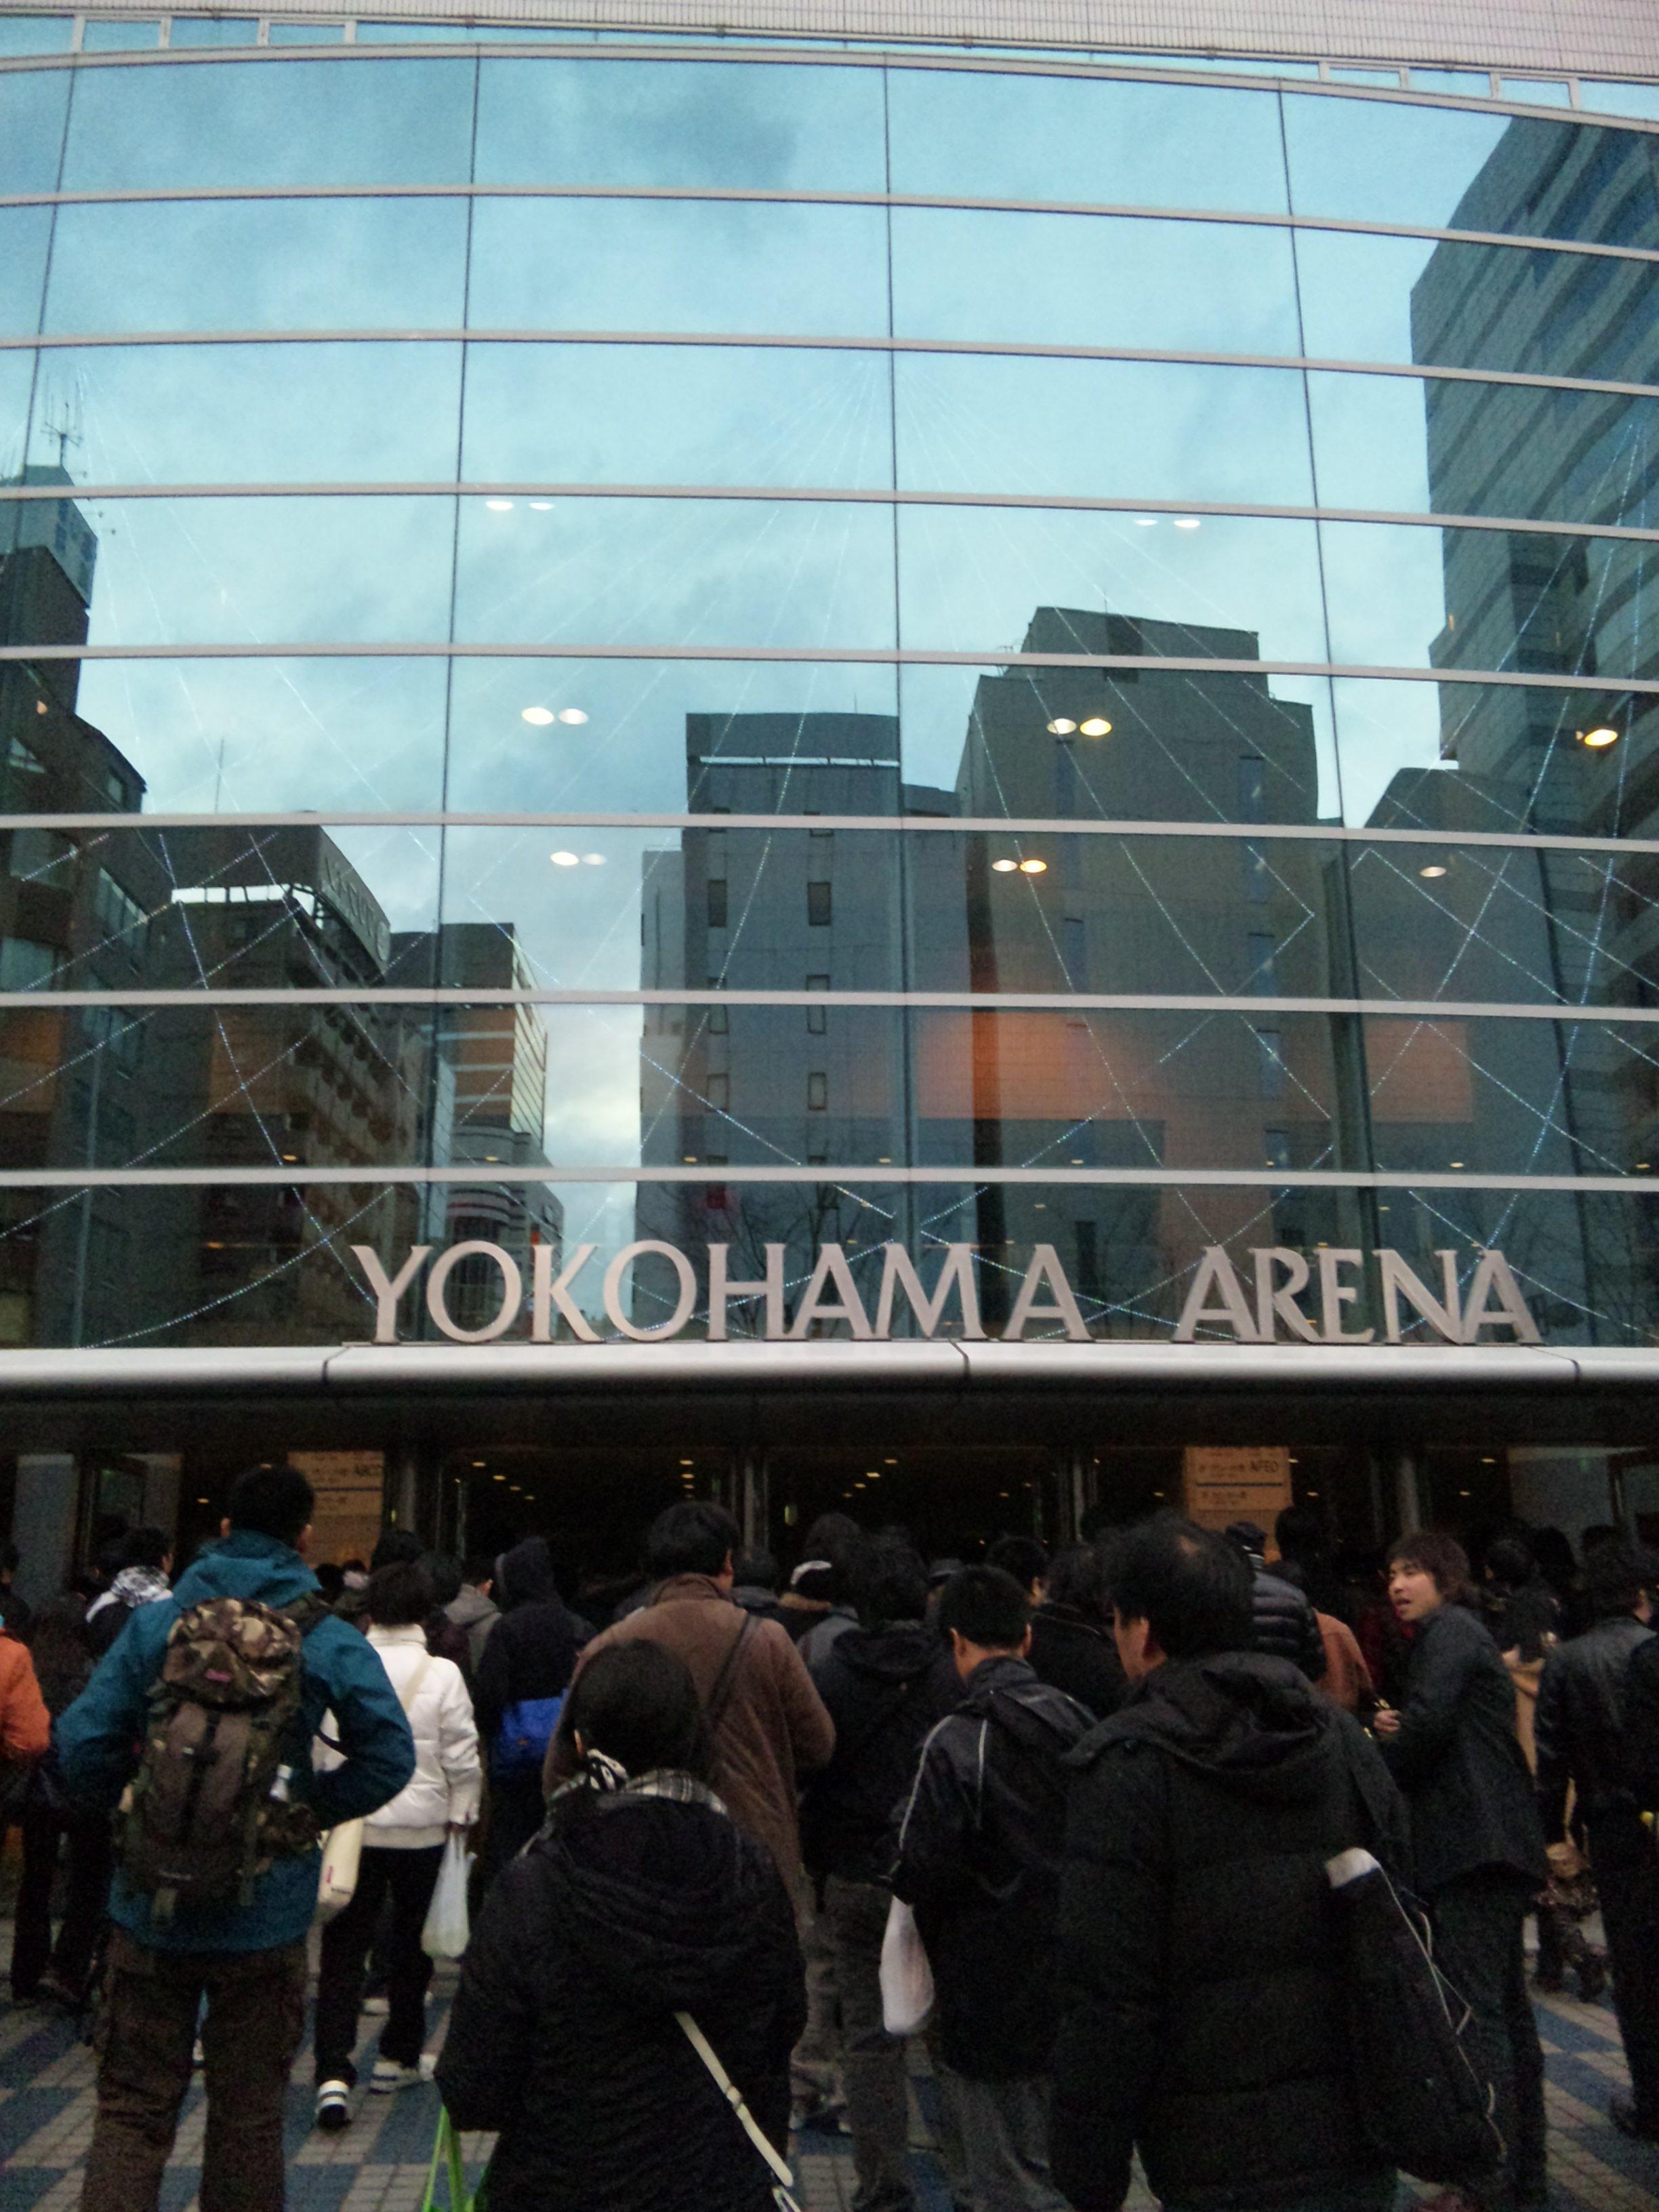 Yokohama Arena image6